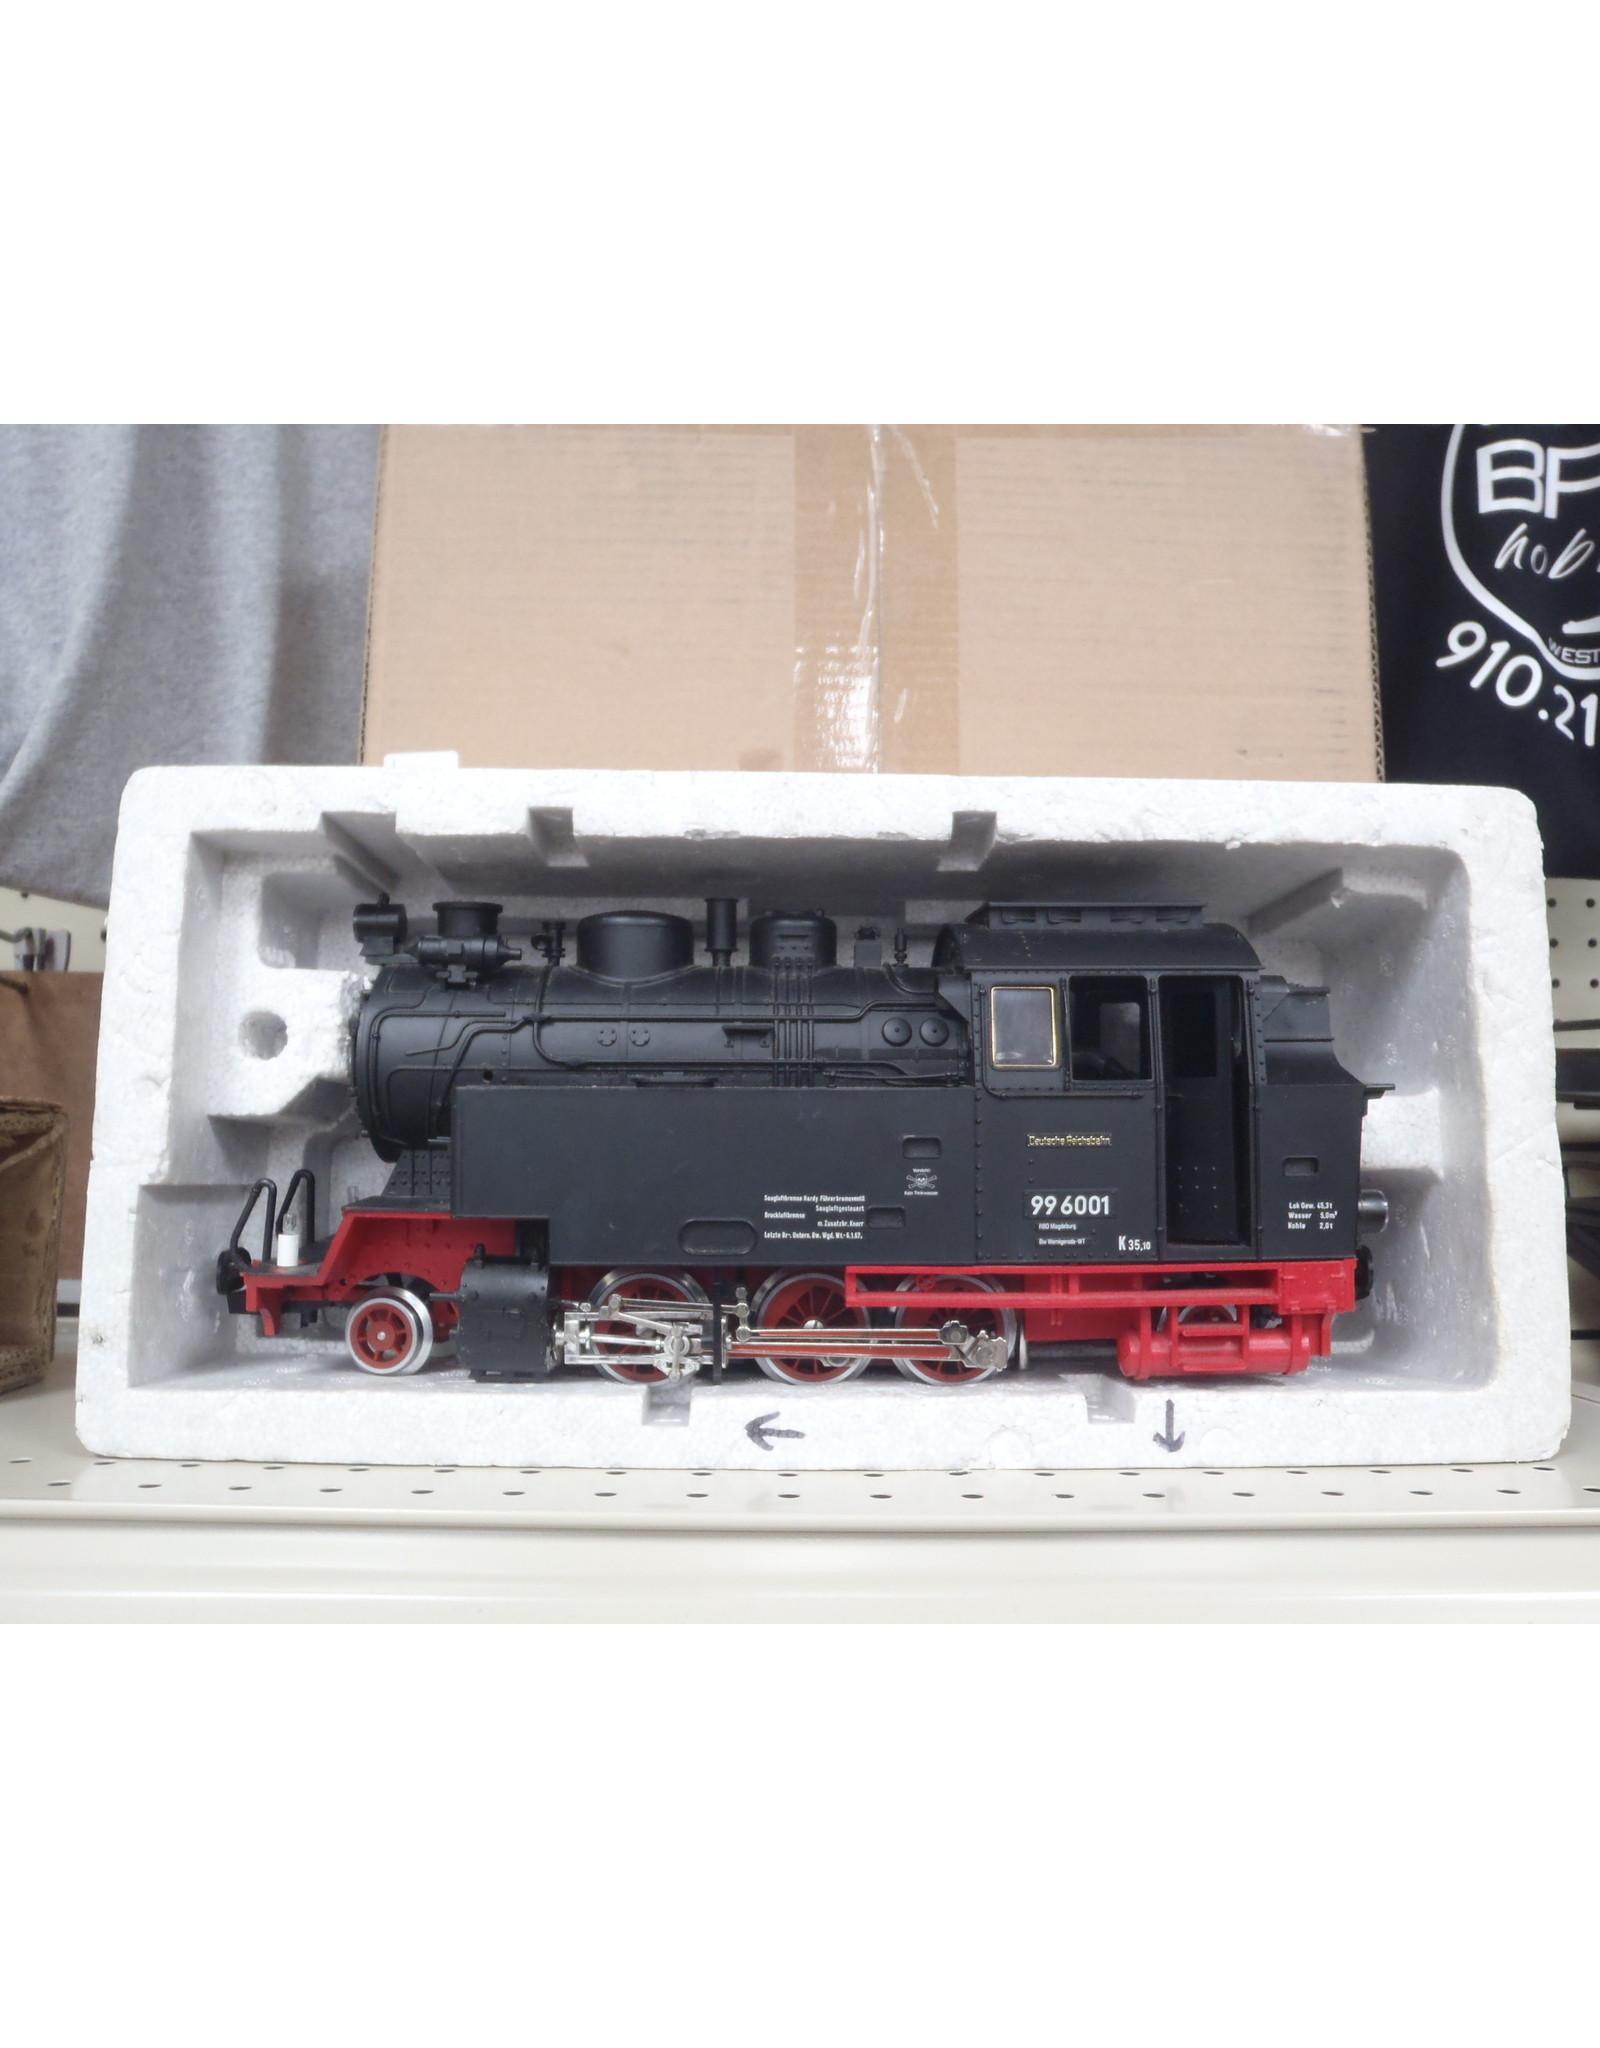 LGB Steam Locomotive 99 6001 Smoke Generator ...